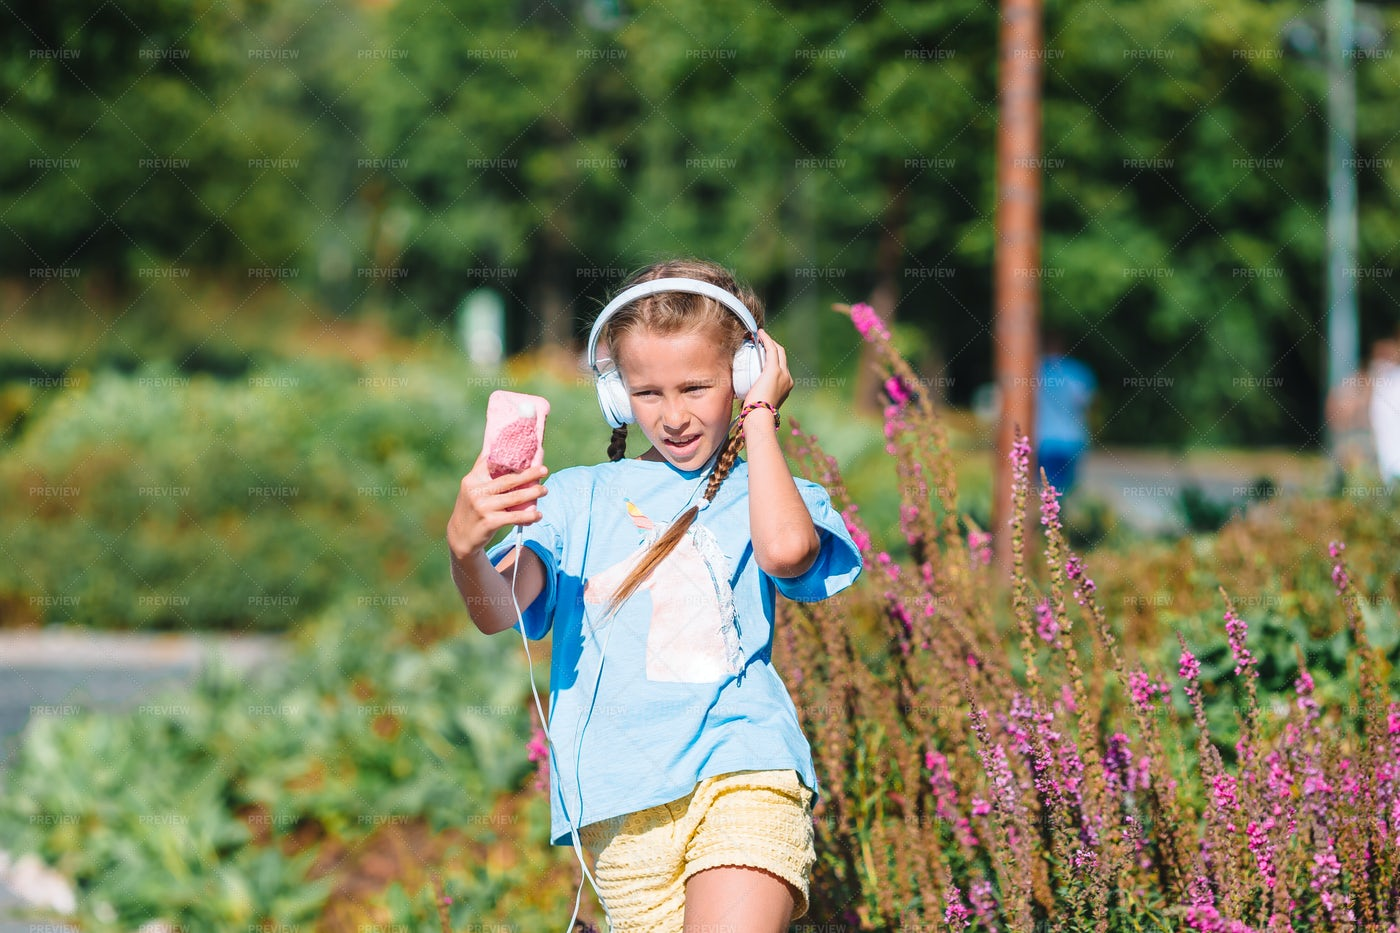 Teen Listens To Music: Stock Photos